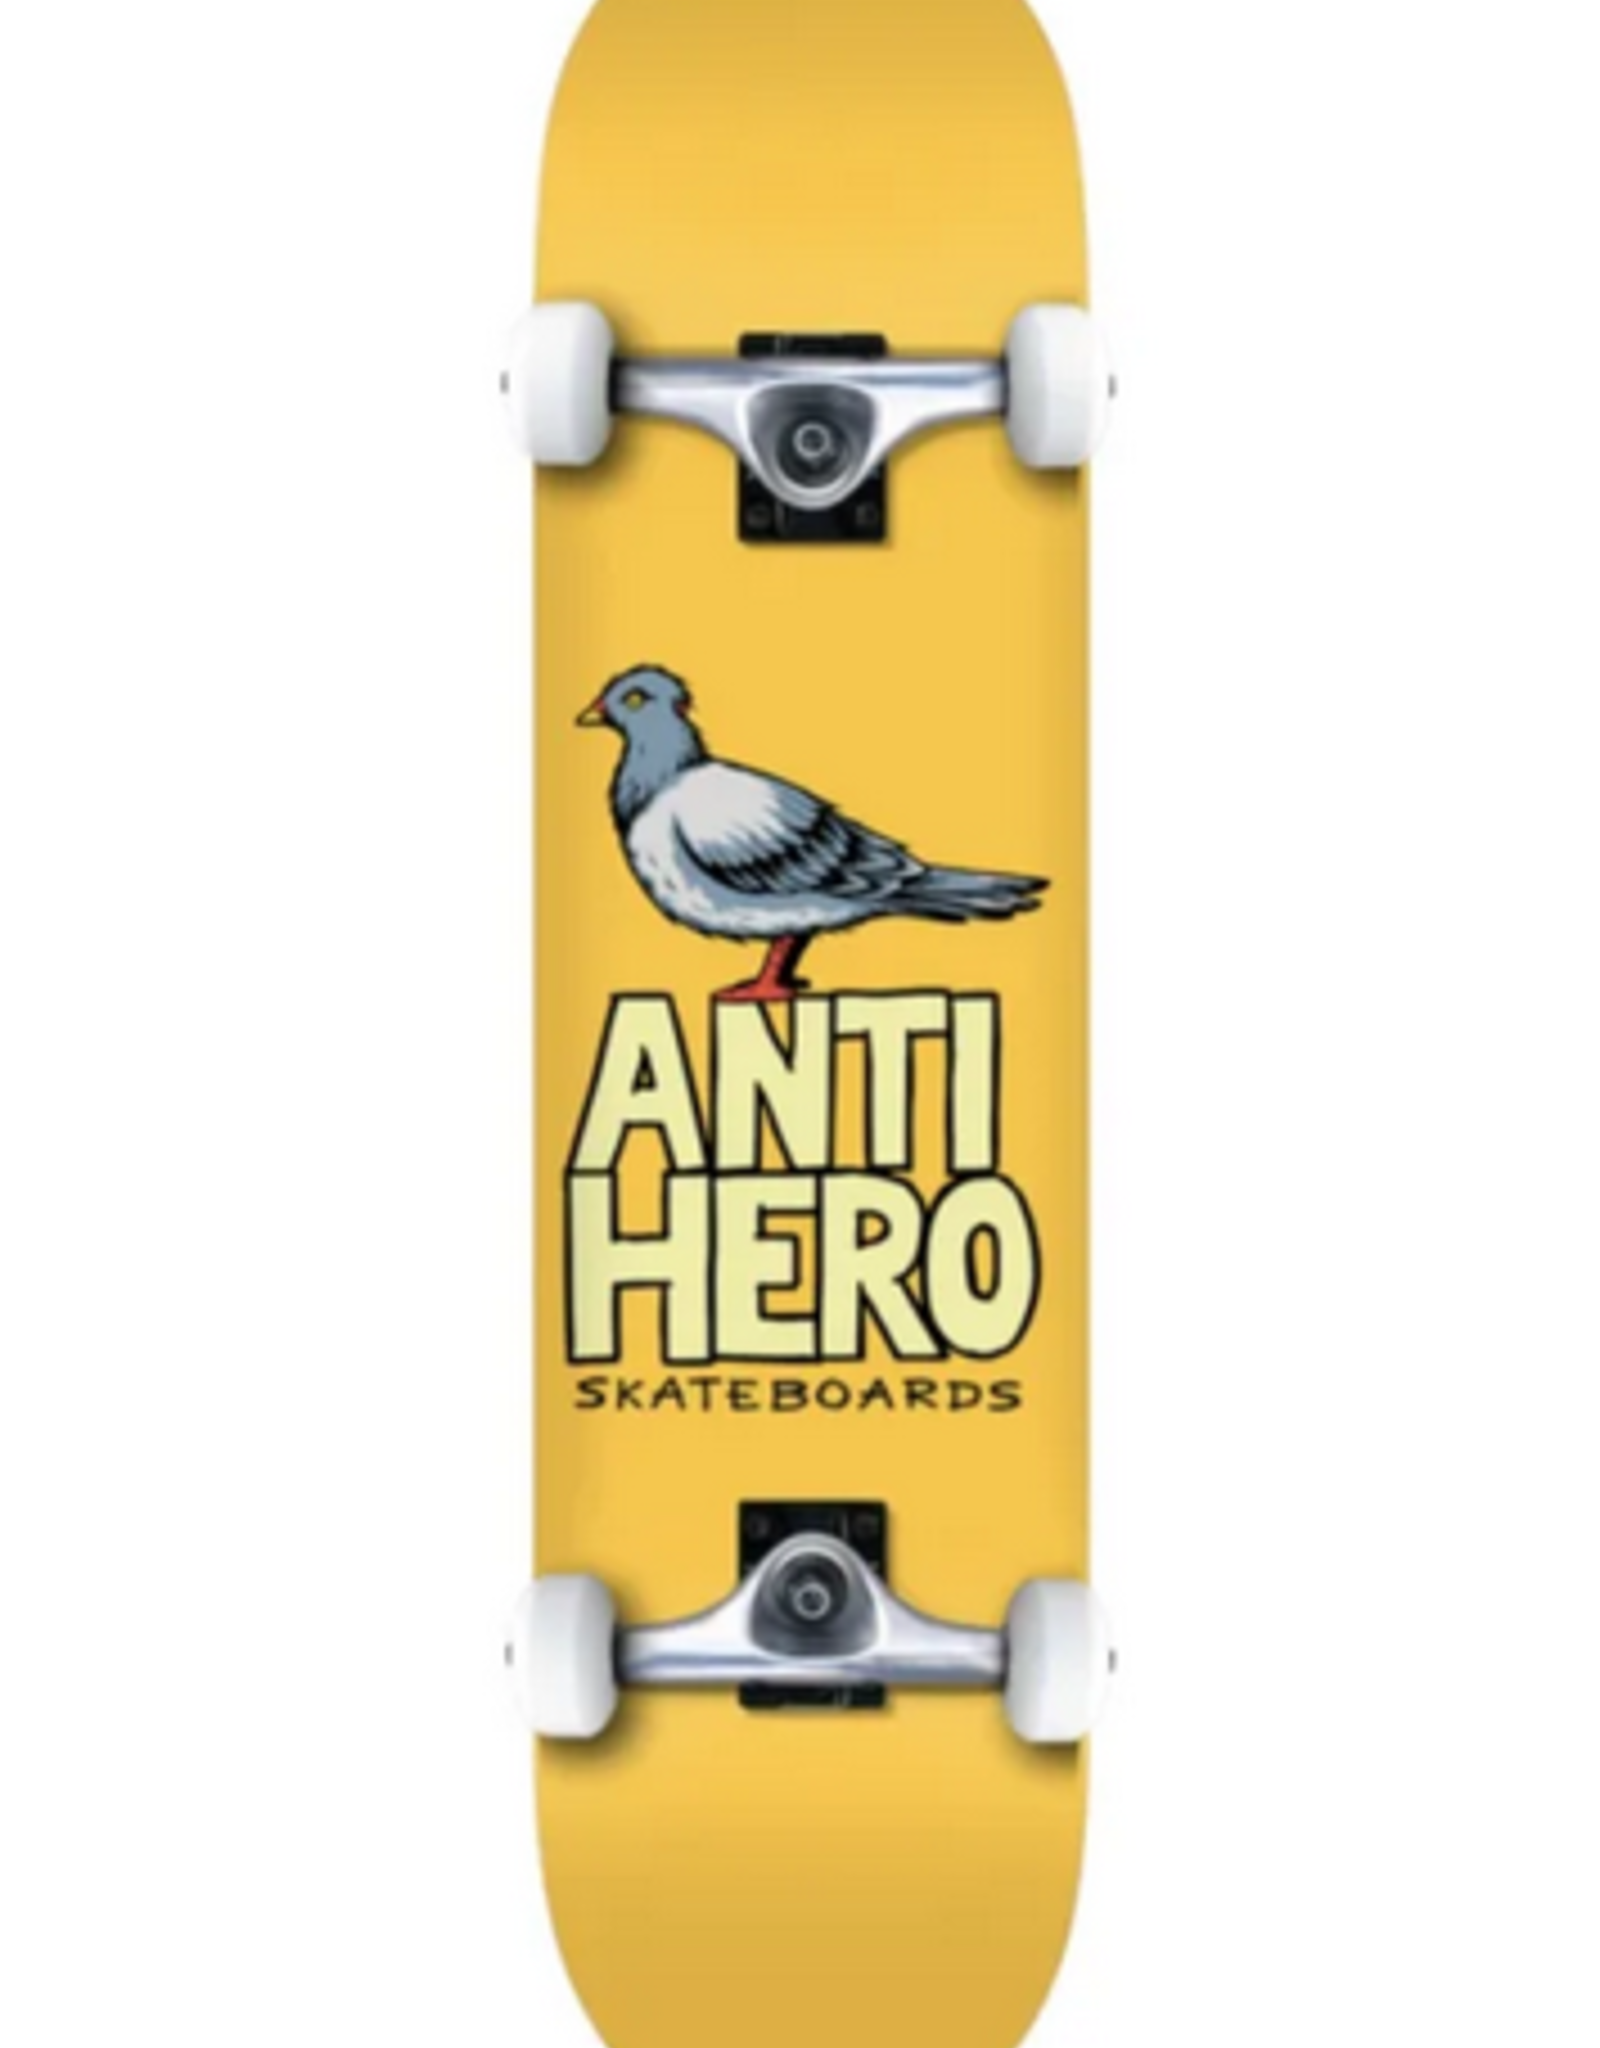 "ANTI-HERO ANTI-HERO 7.3"" CLASSIC EAGLE MINI COMPLETE"